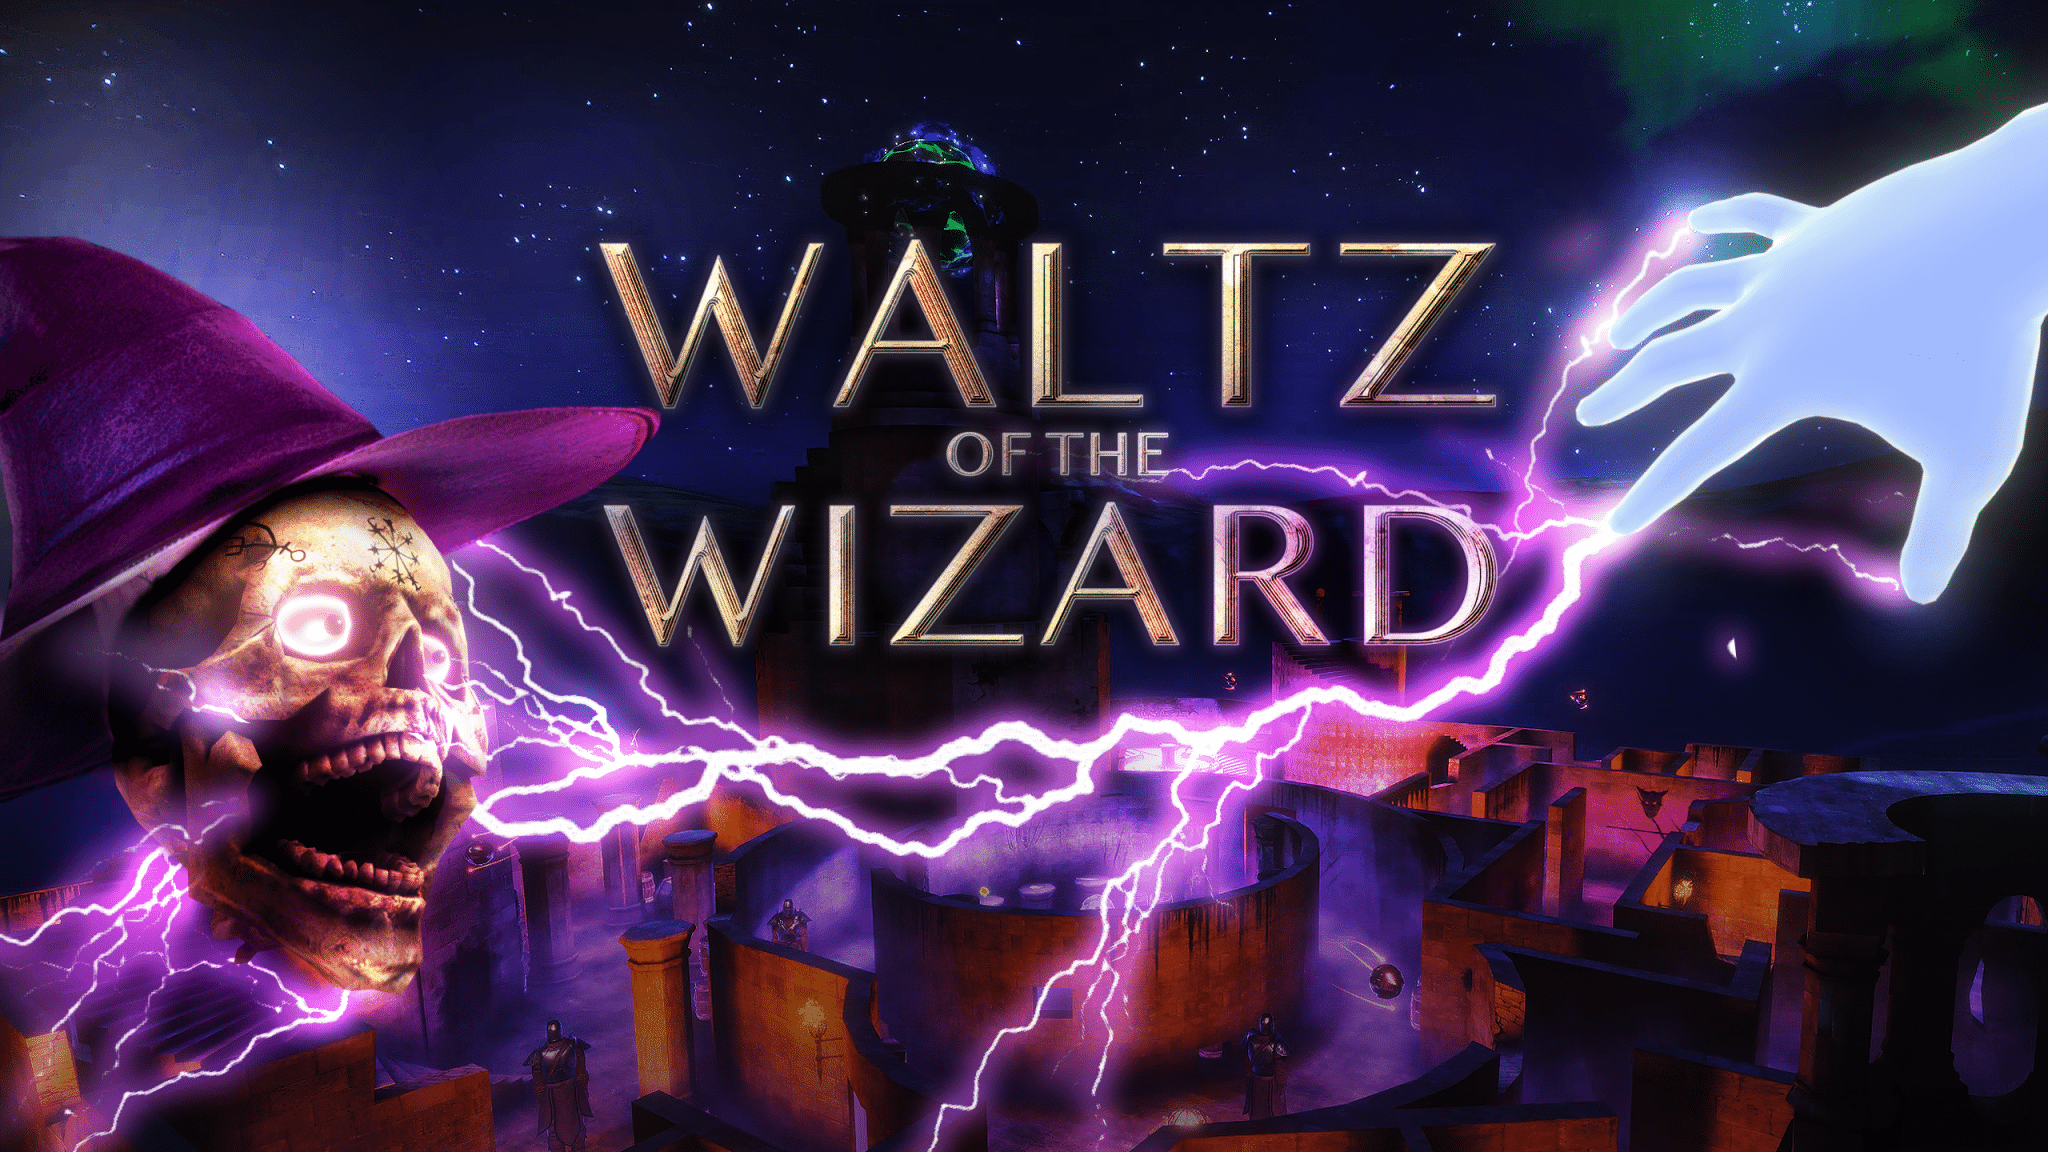 《Waltz of the Wizard》加入更多手势玩法和无障碍功能